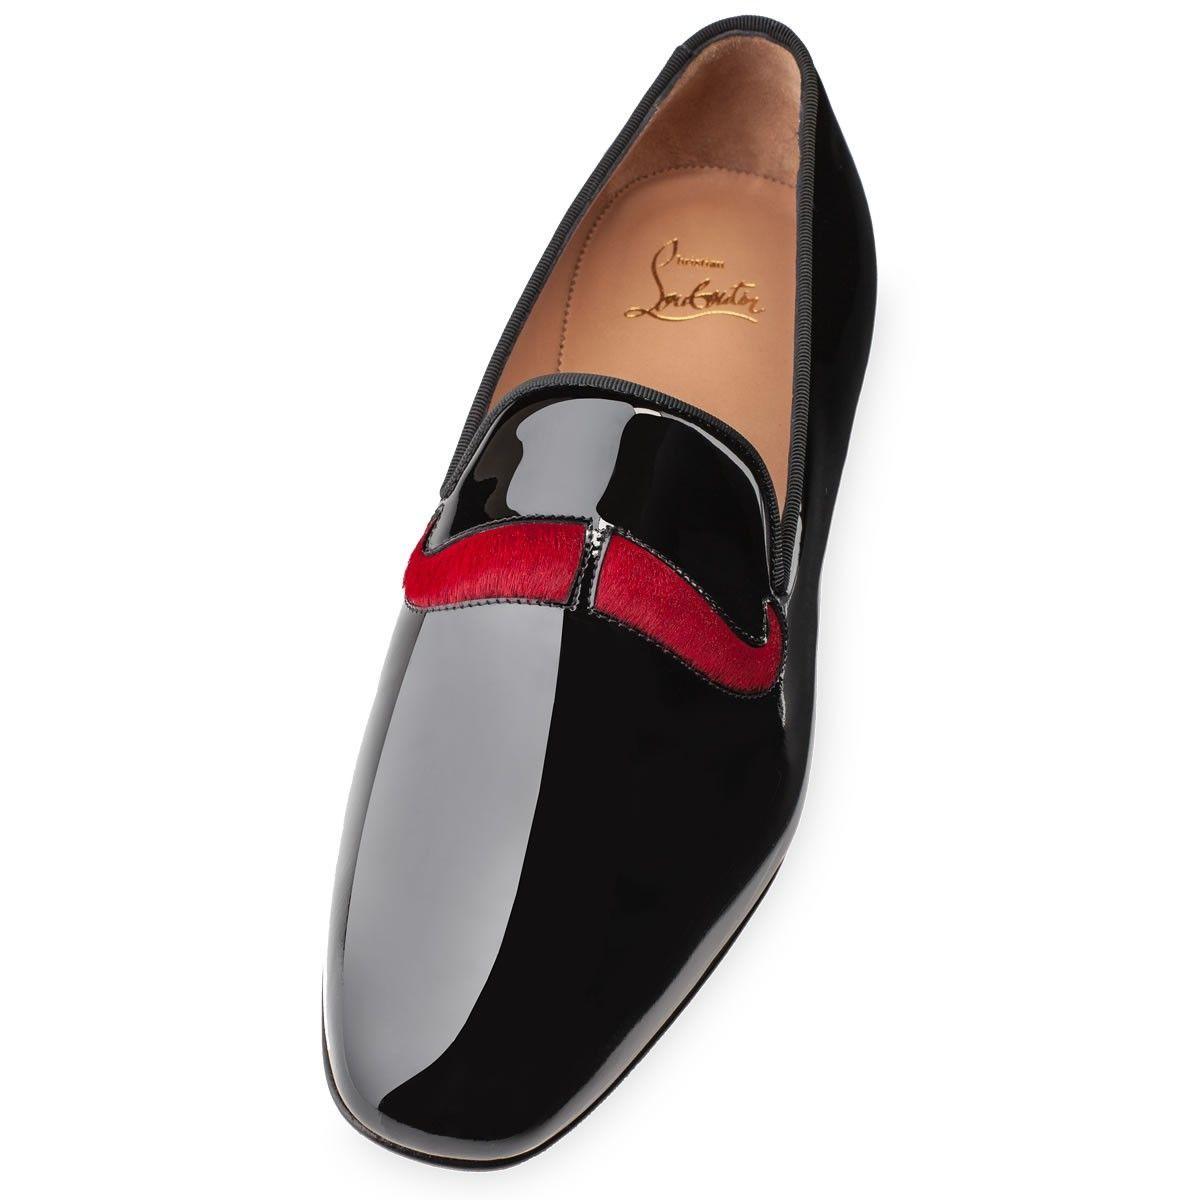 83ef3e84cd0 Christian Louboutin Mens Watson Flat Black Patent Leather Loafers ...